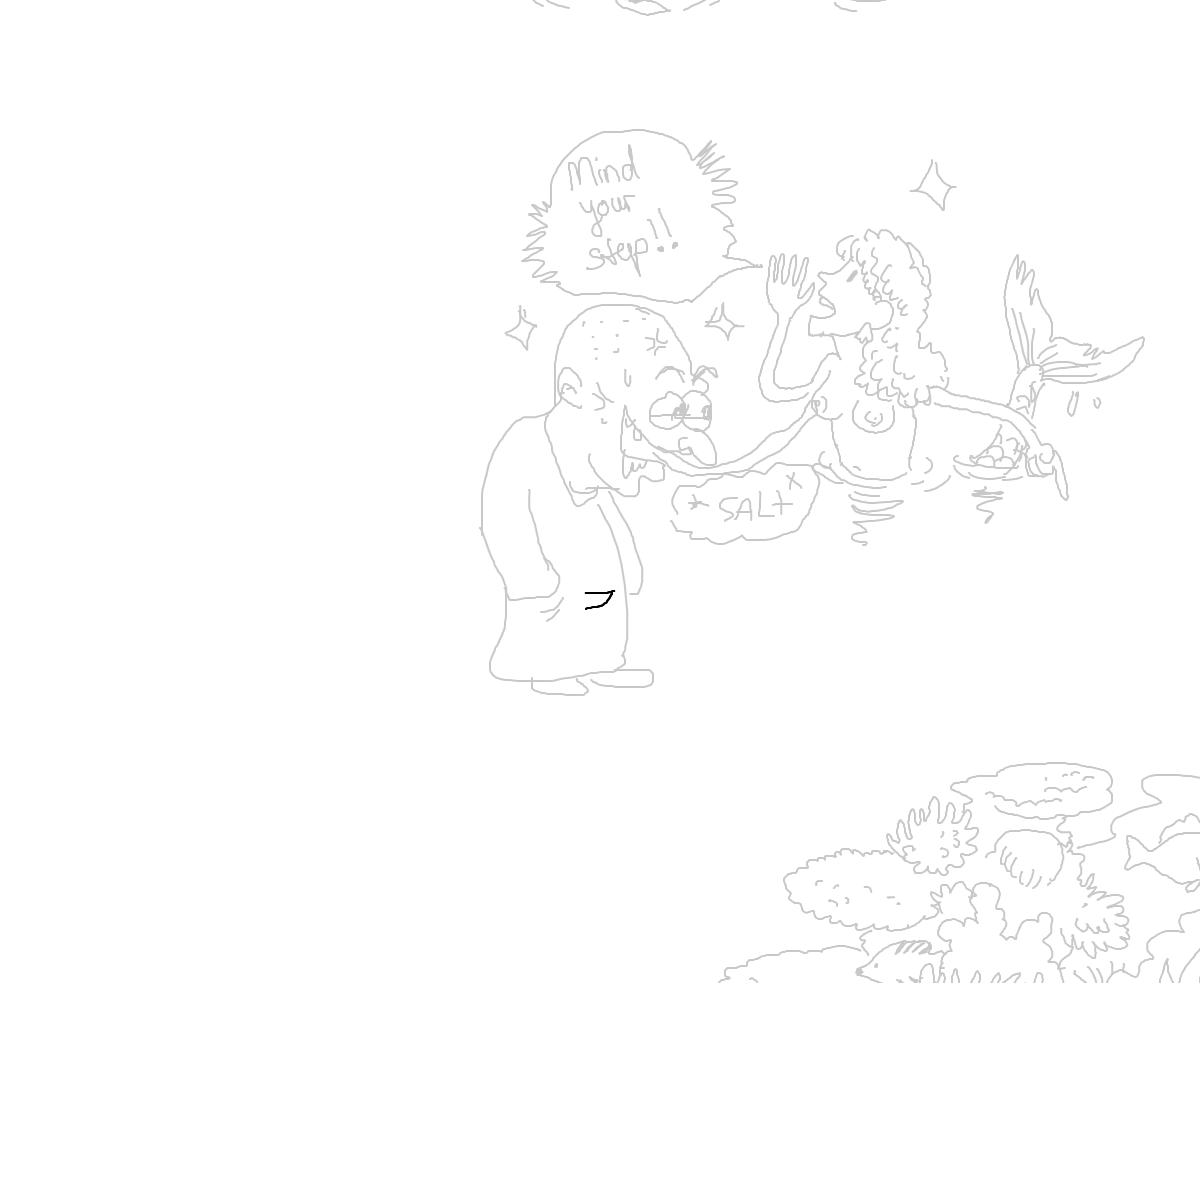 BAAAM drawing#13315 lat:78.4205245971679700lng: -4.4854674339294430